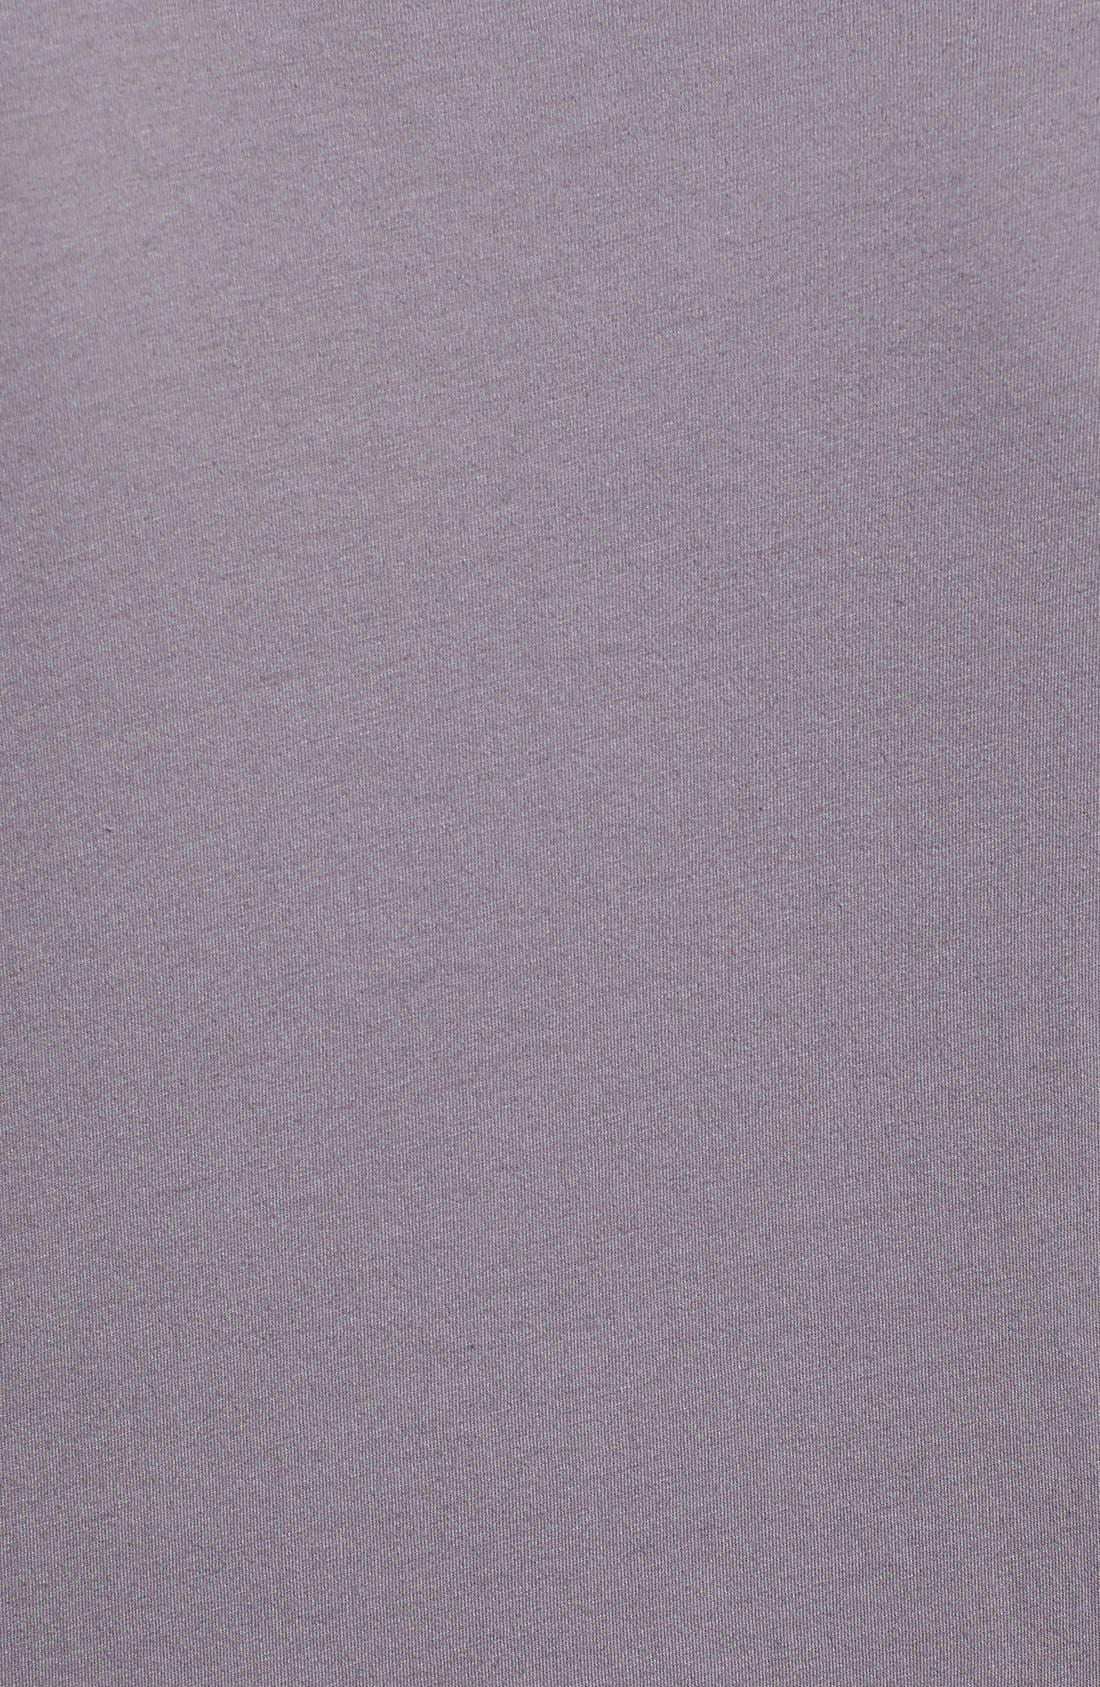 'Ace' Slim Fit T-Shirt,                             Alternate thumbnail 3, color,                             Grey